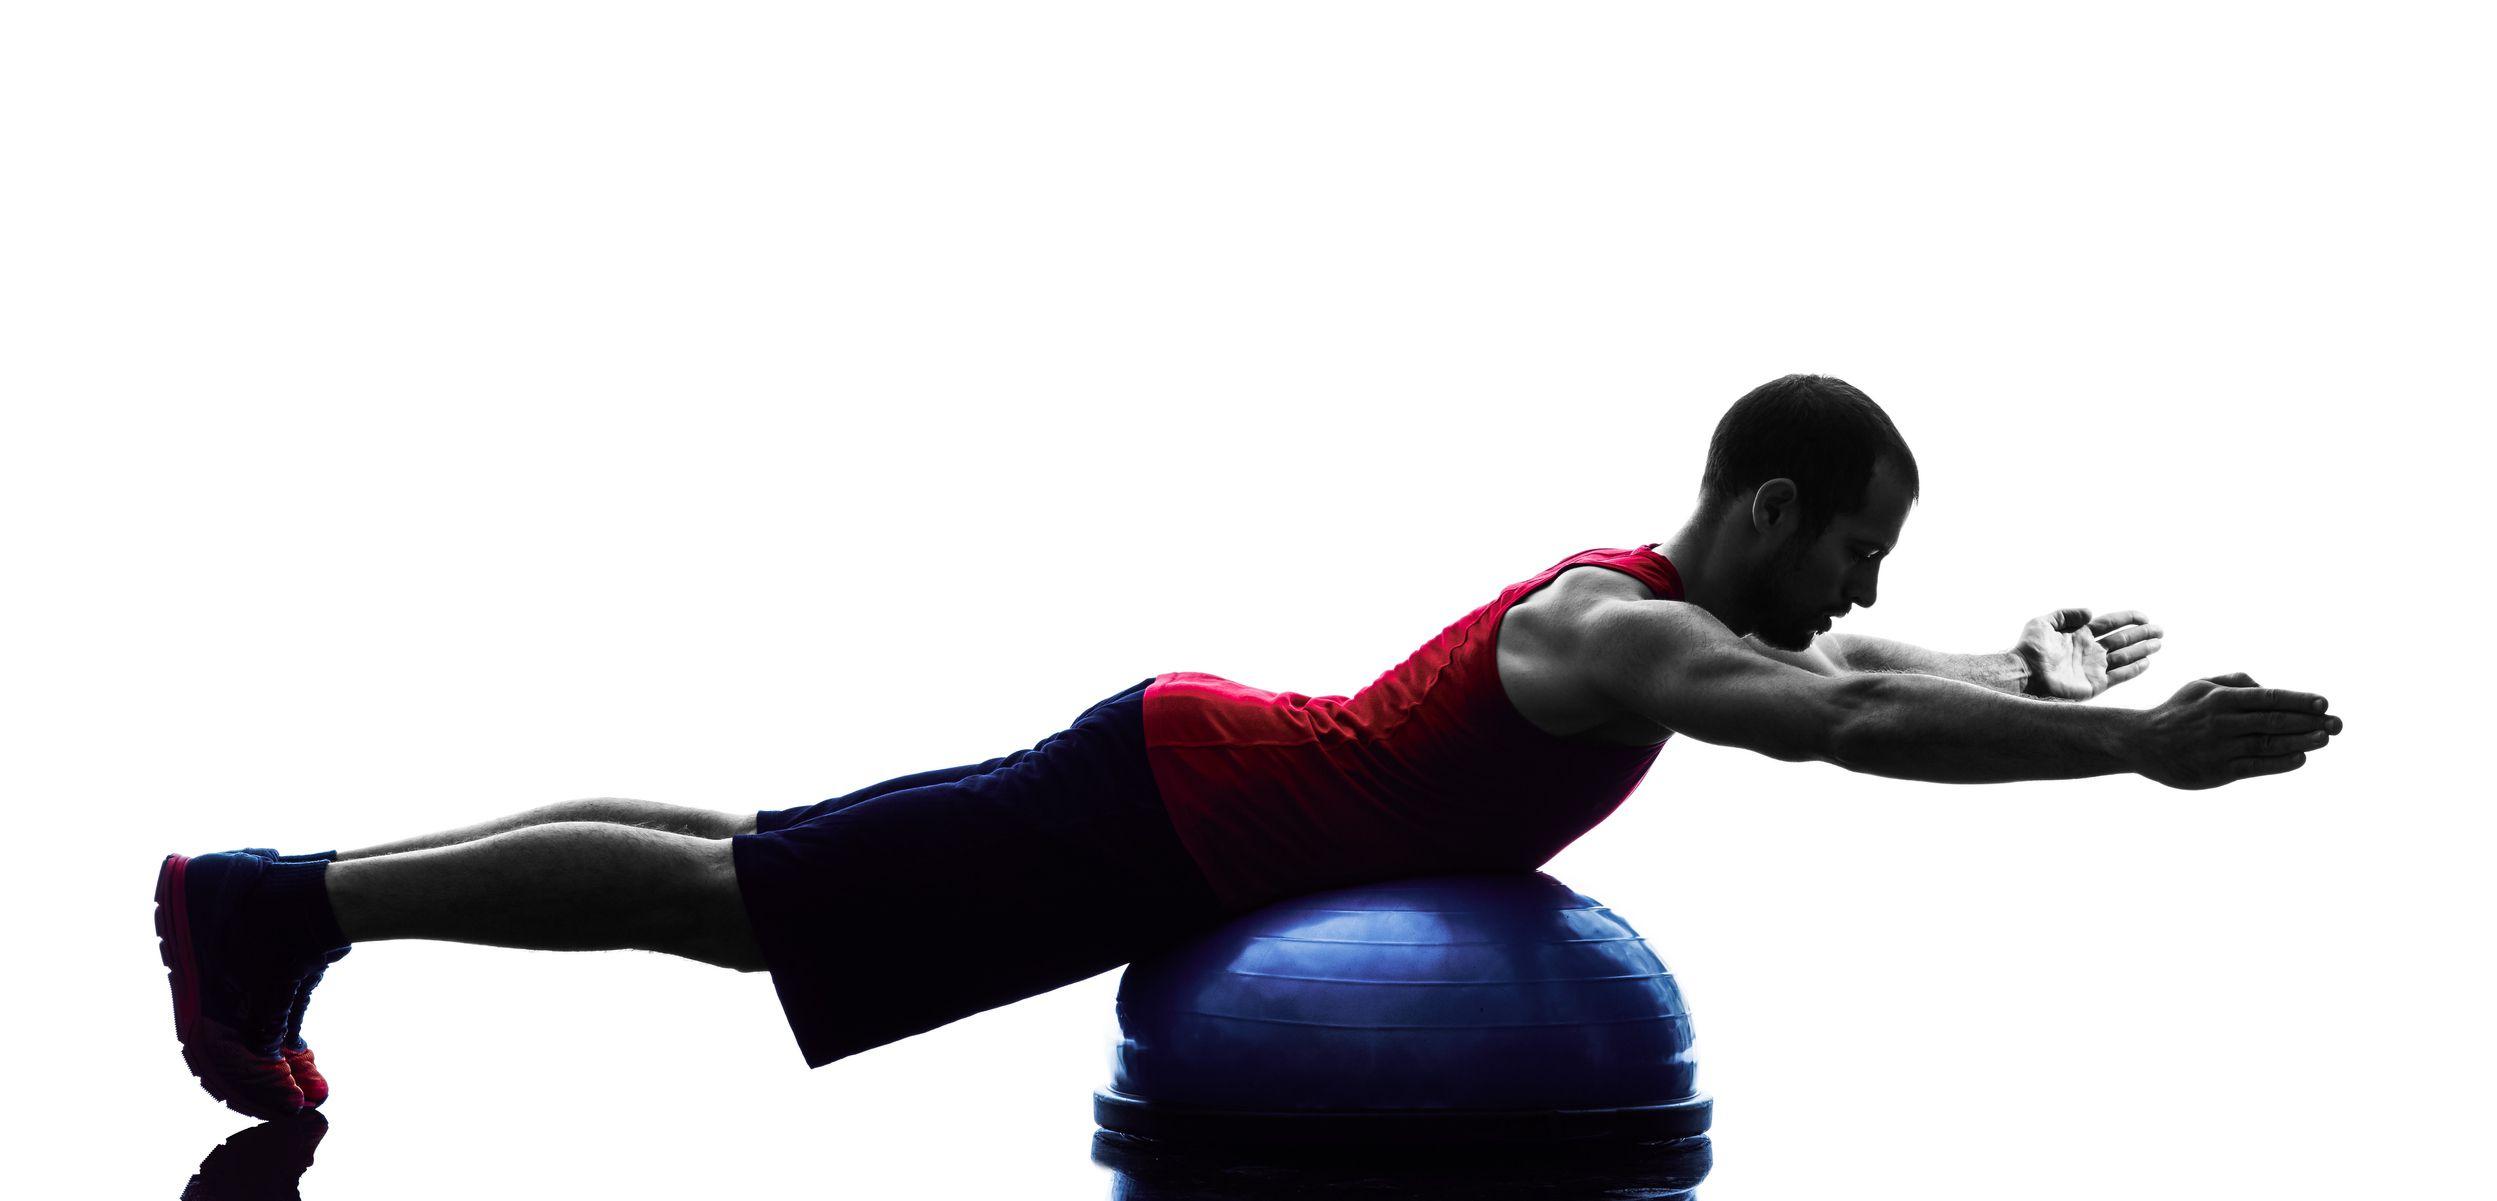 BOSU ball back extension